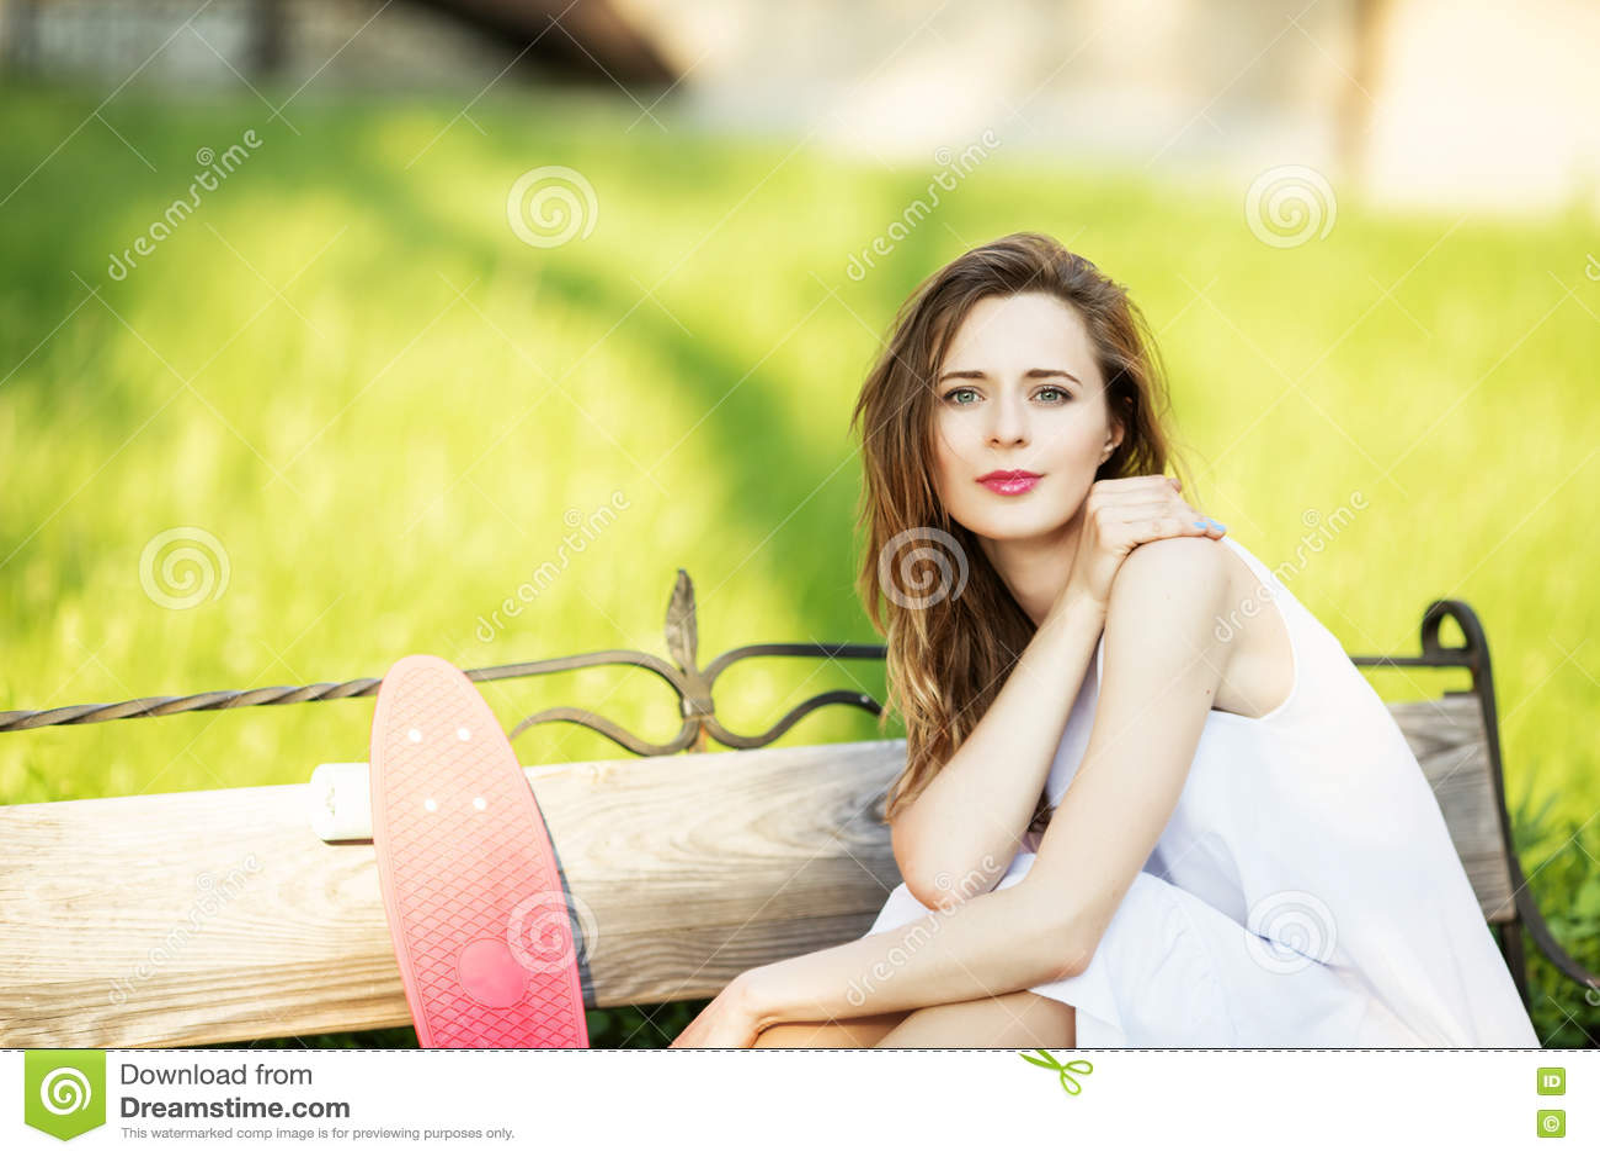 Stående av en lycklig le ung kvinna med en rosa skateboard